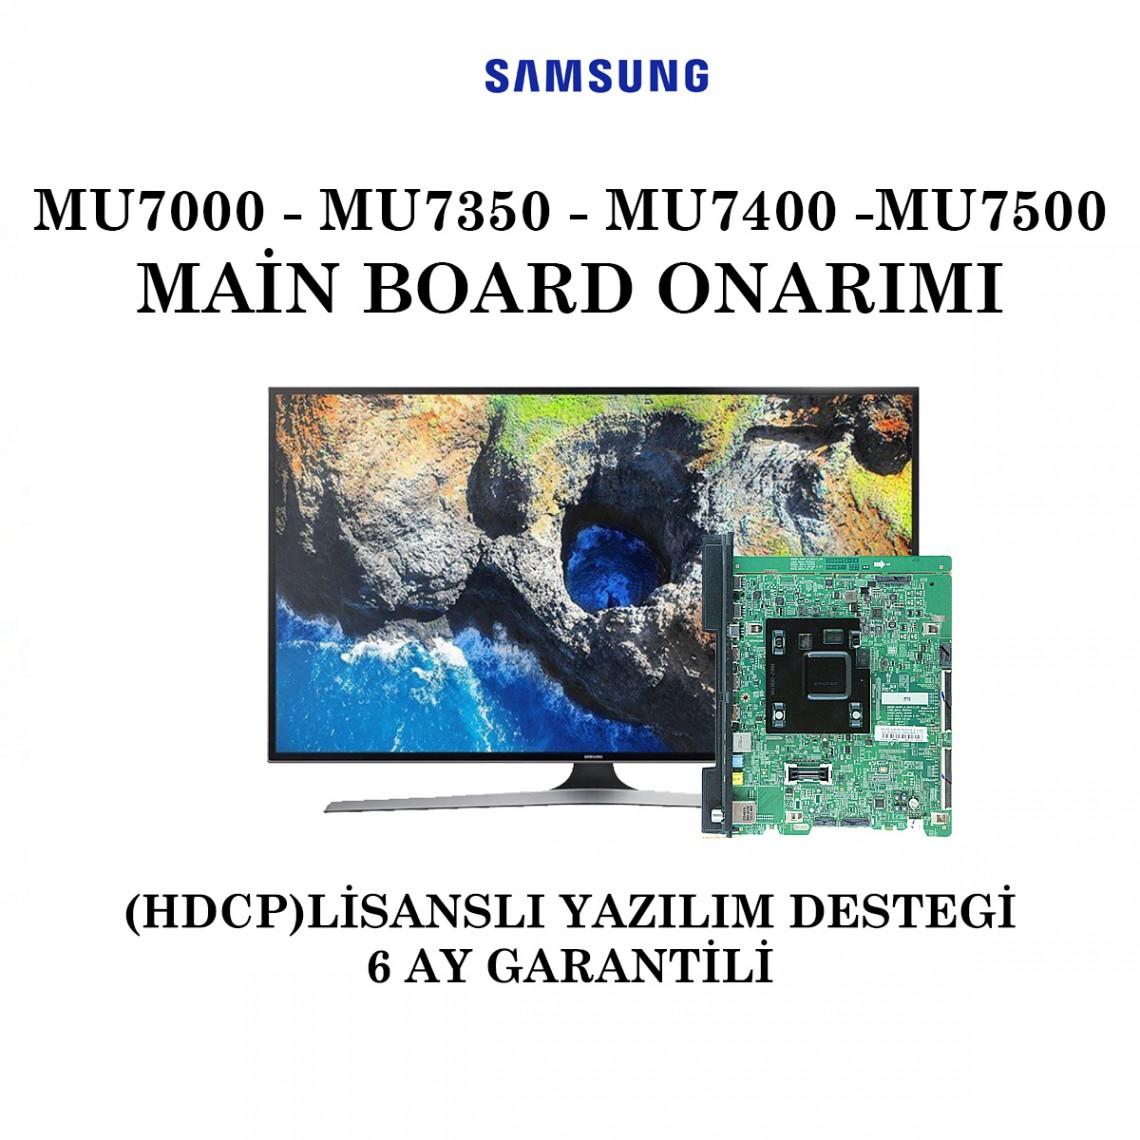 SAMSUNG, BN41-02568A, BN41-02568B, UE40MU7000, UE43MU7000, UE49MU7000, UE49MU7350, UE49MU7400, UE55MU7000, UE55MU7350, UE55MU7500, Main Board Onarımı